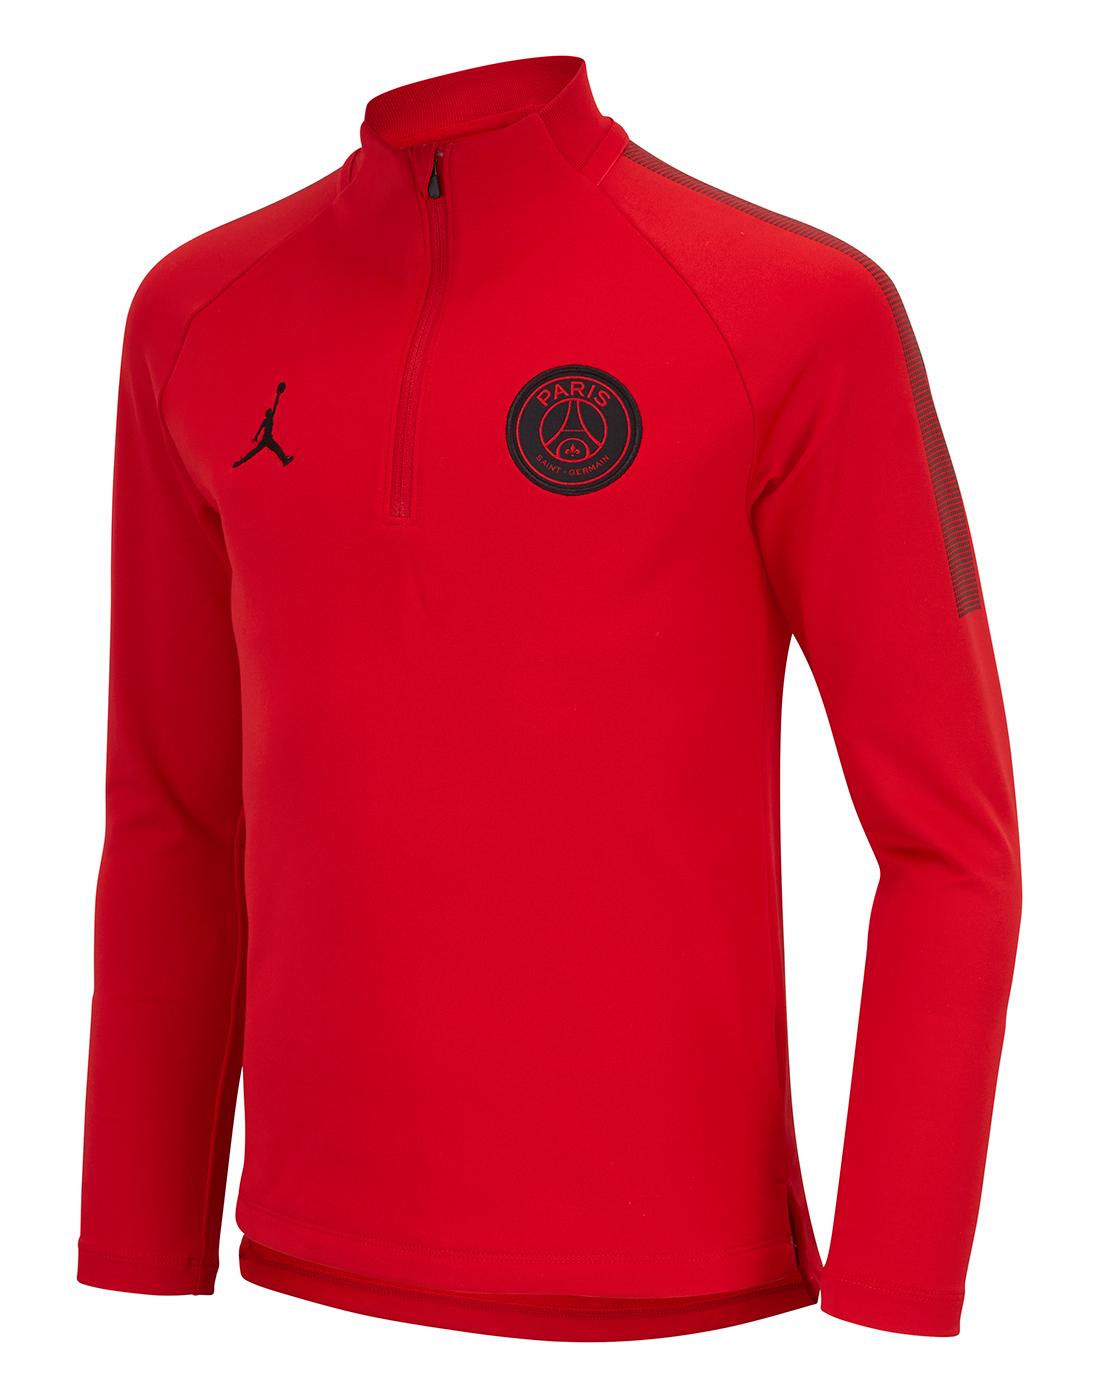 cheap for discount 5cd81 dbd01 Nike Kids PSG Jordan Training 1/4 Zip   Life Style Sports